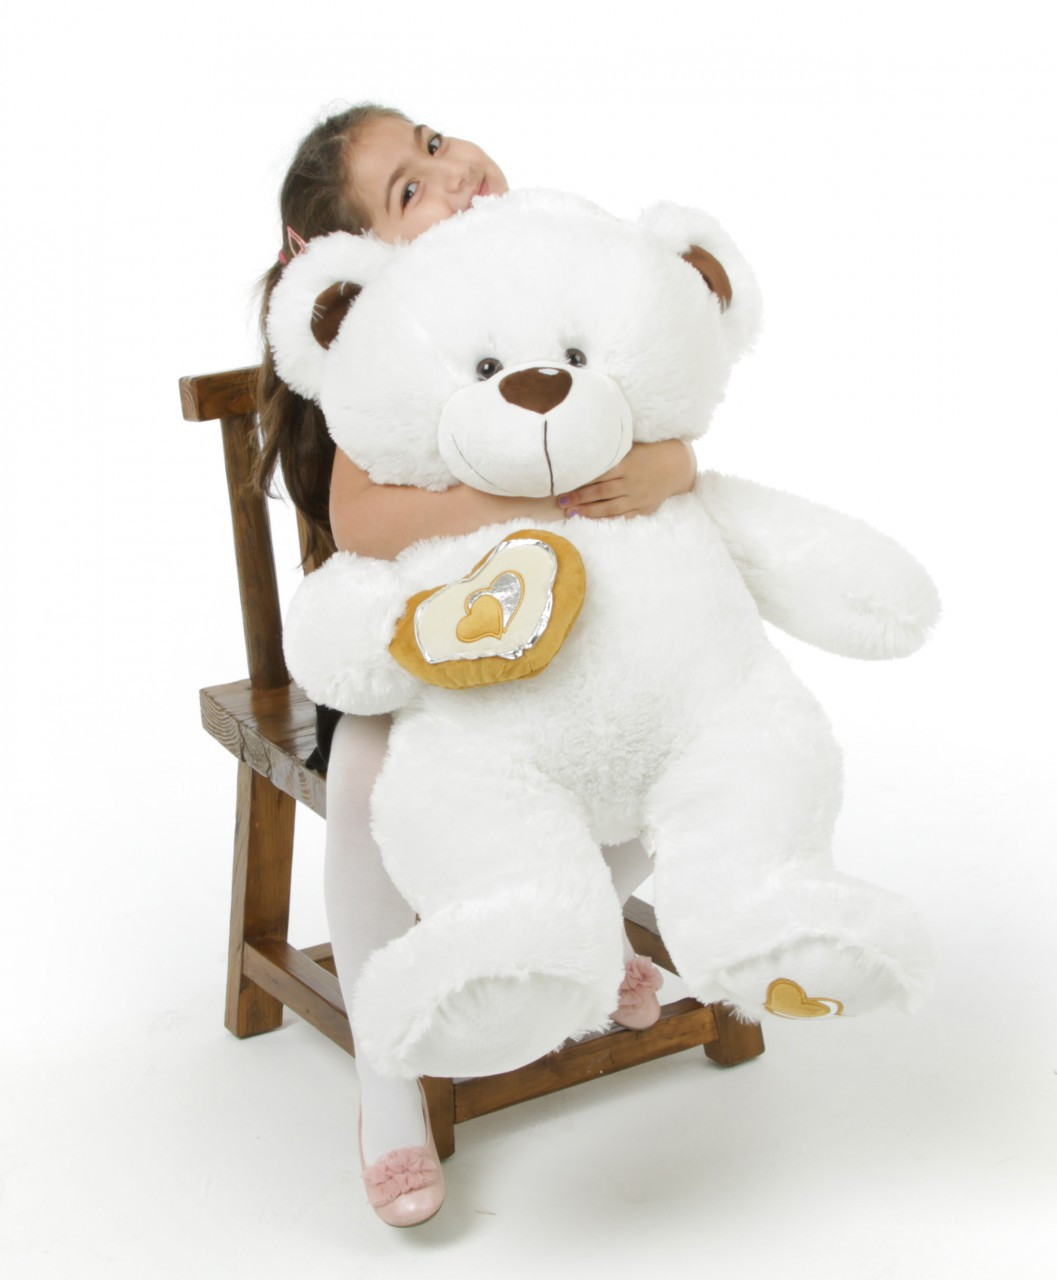 36in Chomps Big Love huggable white teddy bear